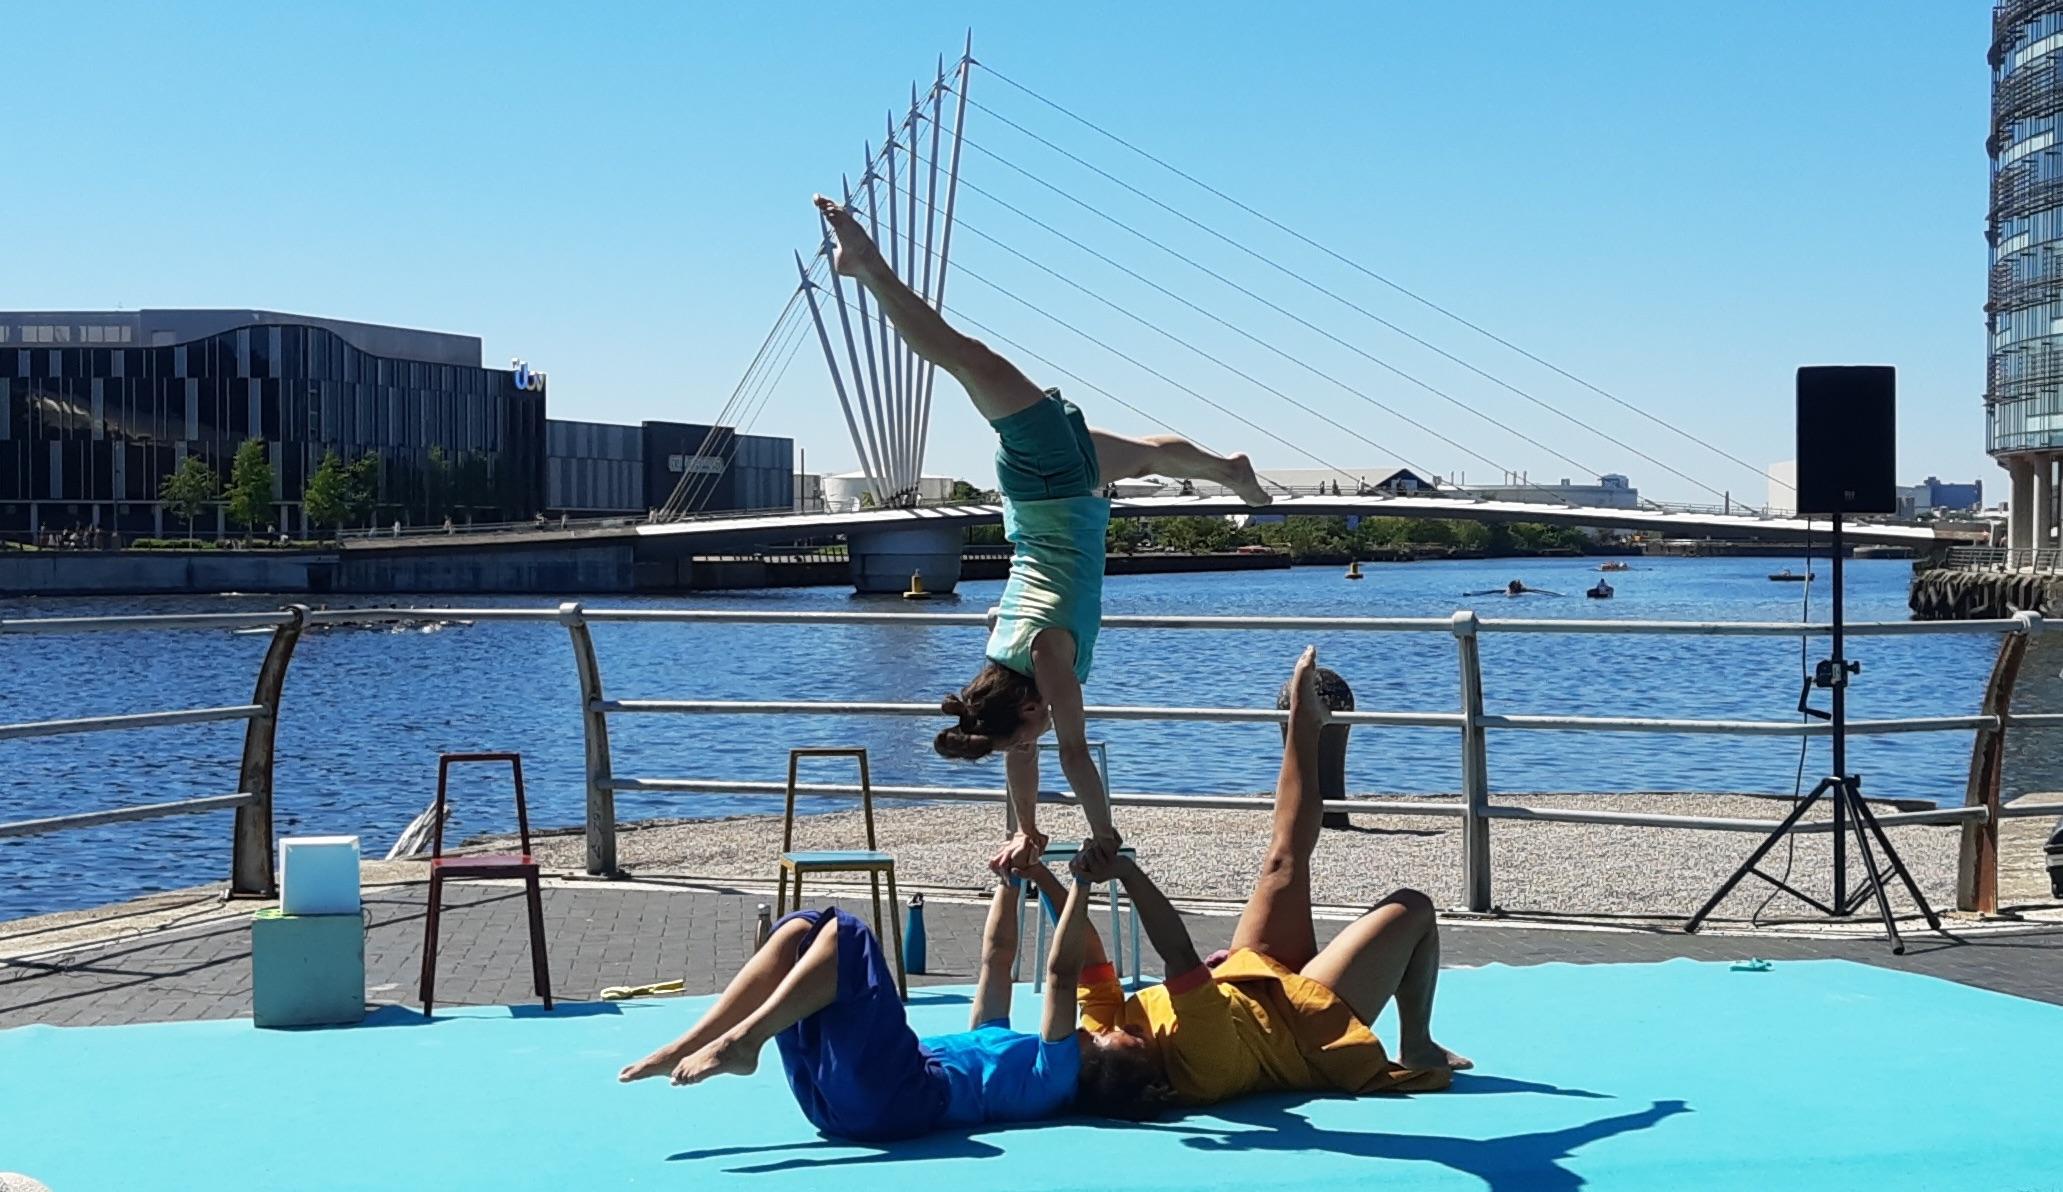 3 acrobats perform an acrobalance trick.